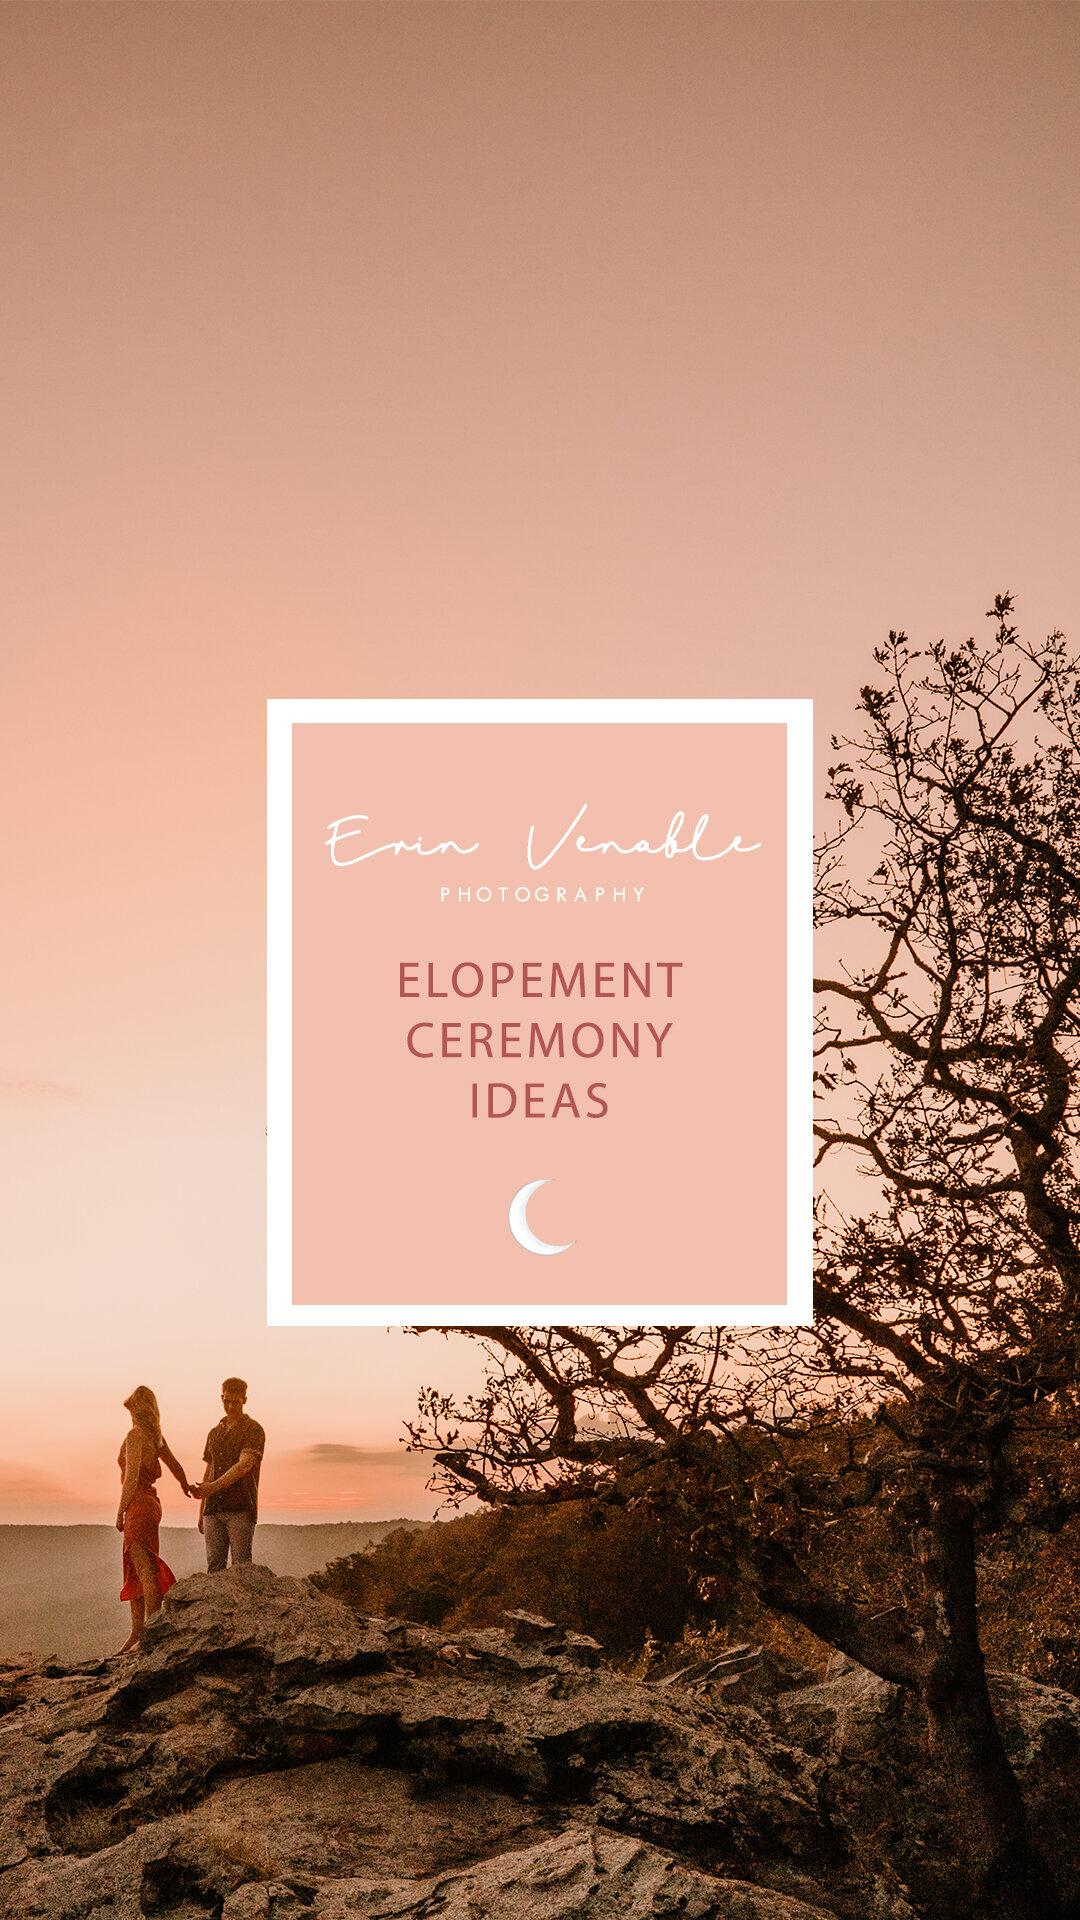 elopement ceremony ideas.jpg